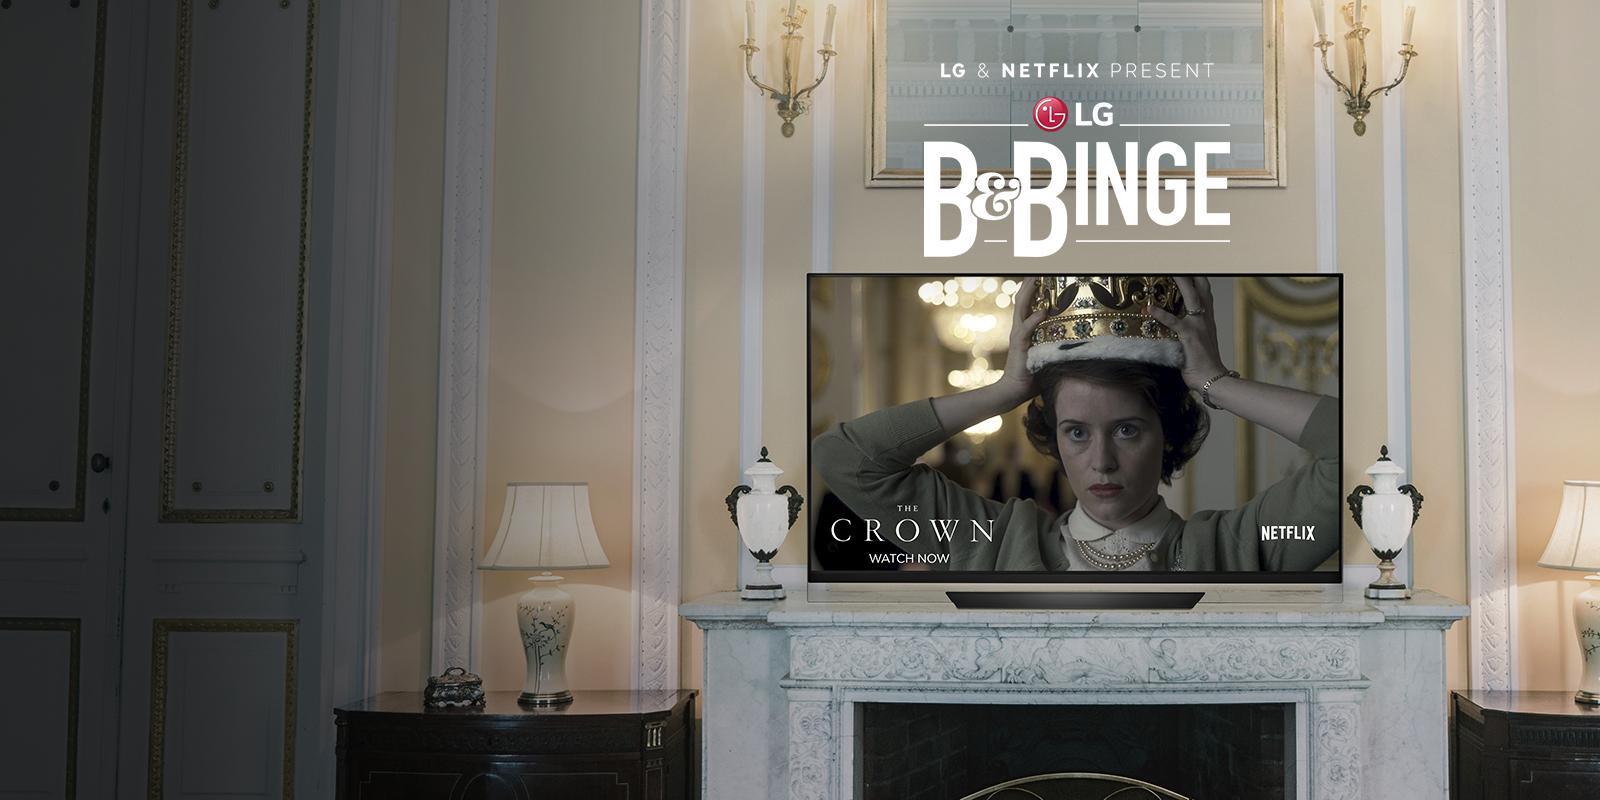 The Ultimate Binge Watching Experience